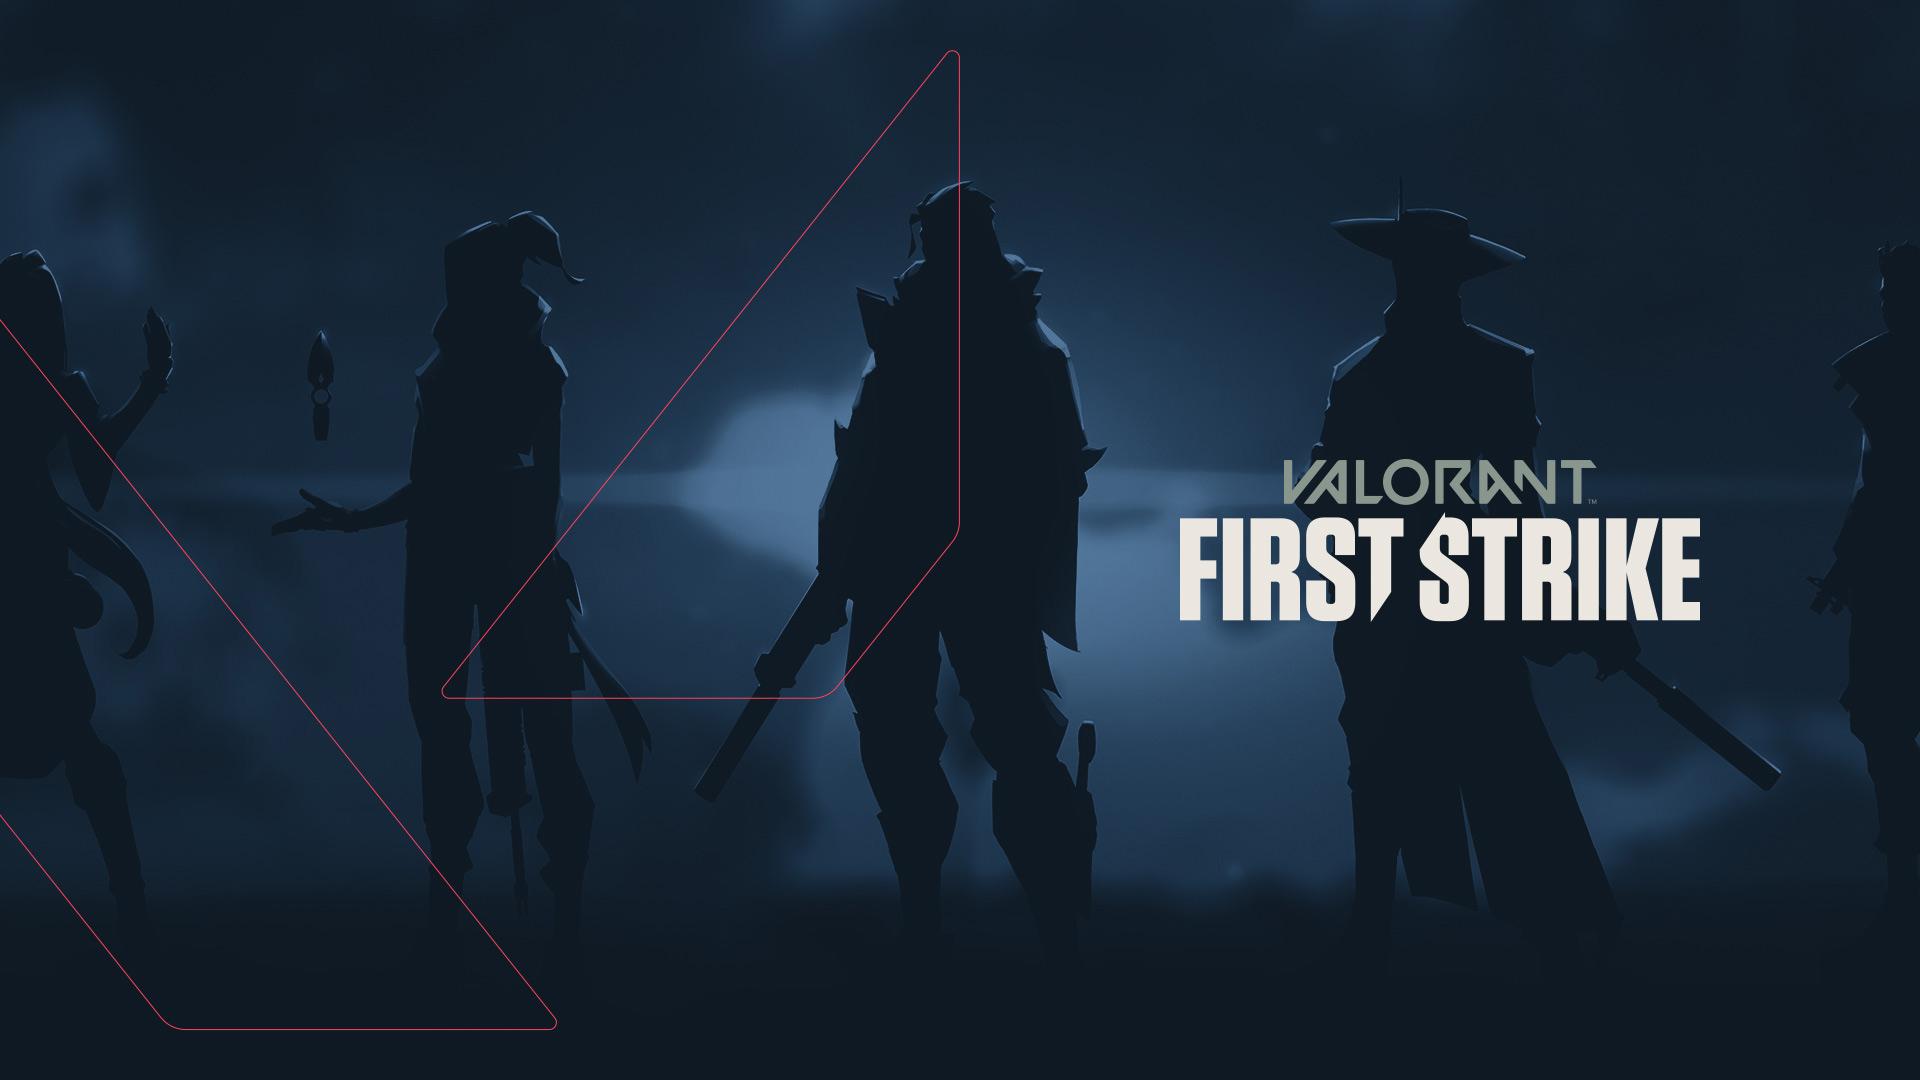 Riot Games' First Strike Valorant tournament.